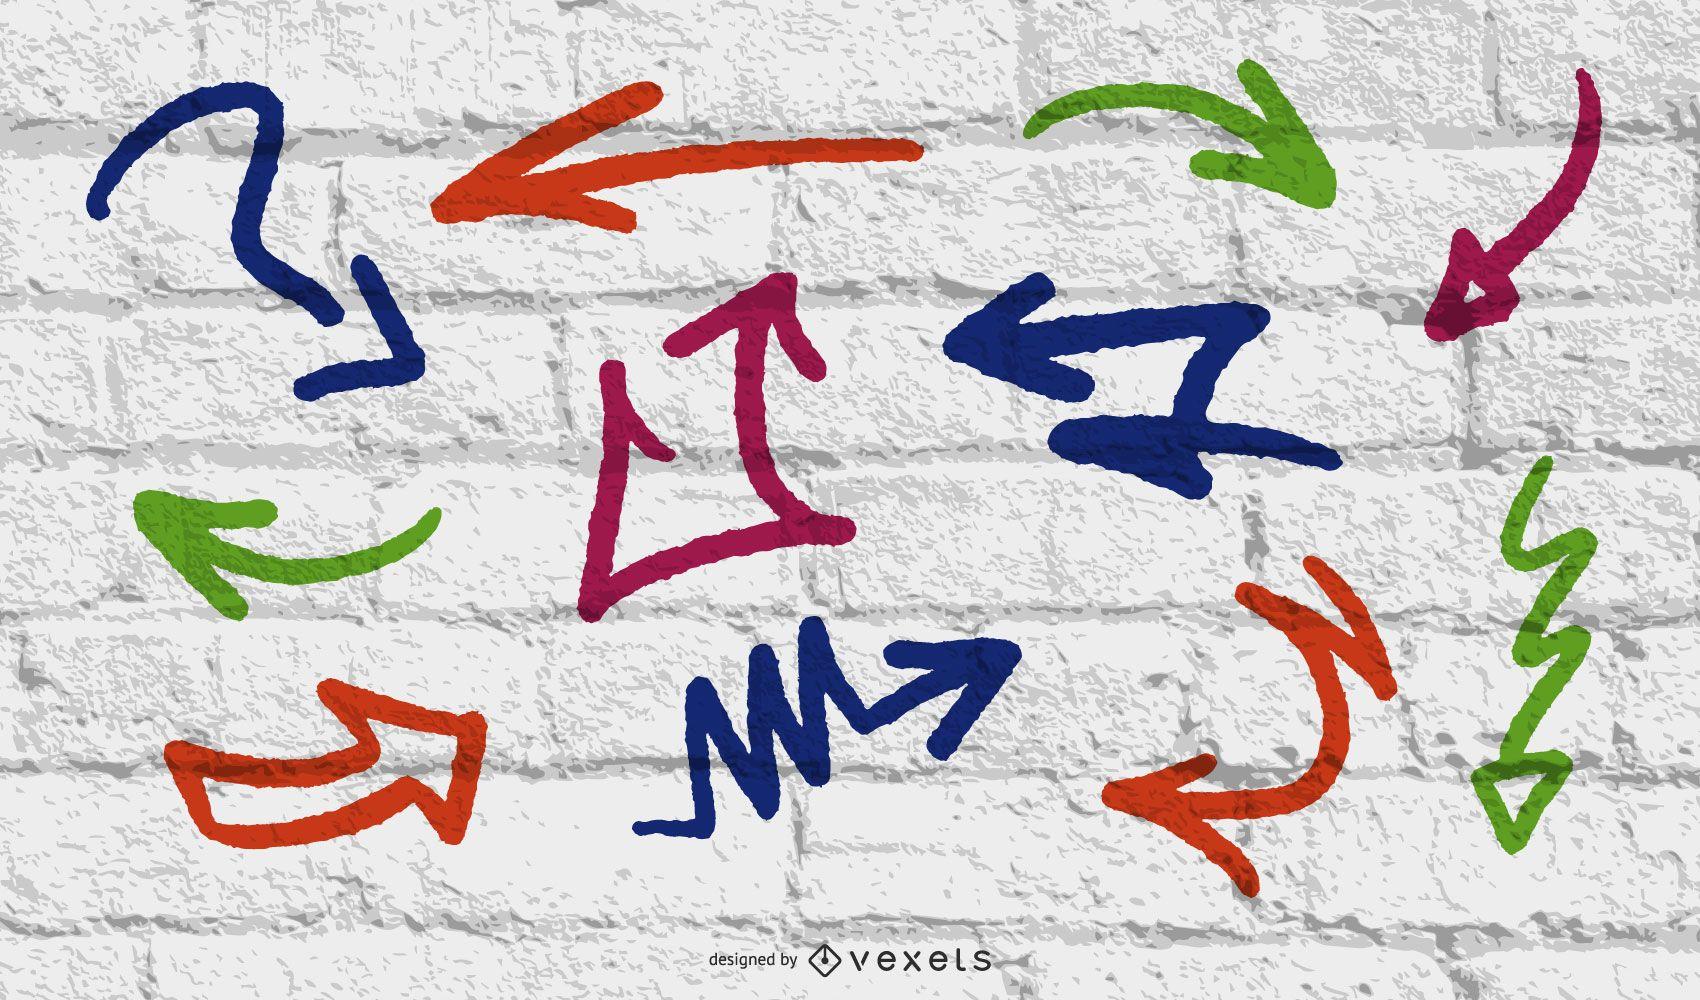 Graffiti Arrows Elements Set